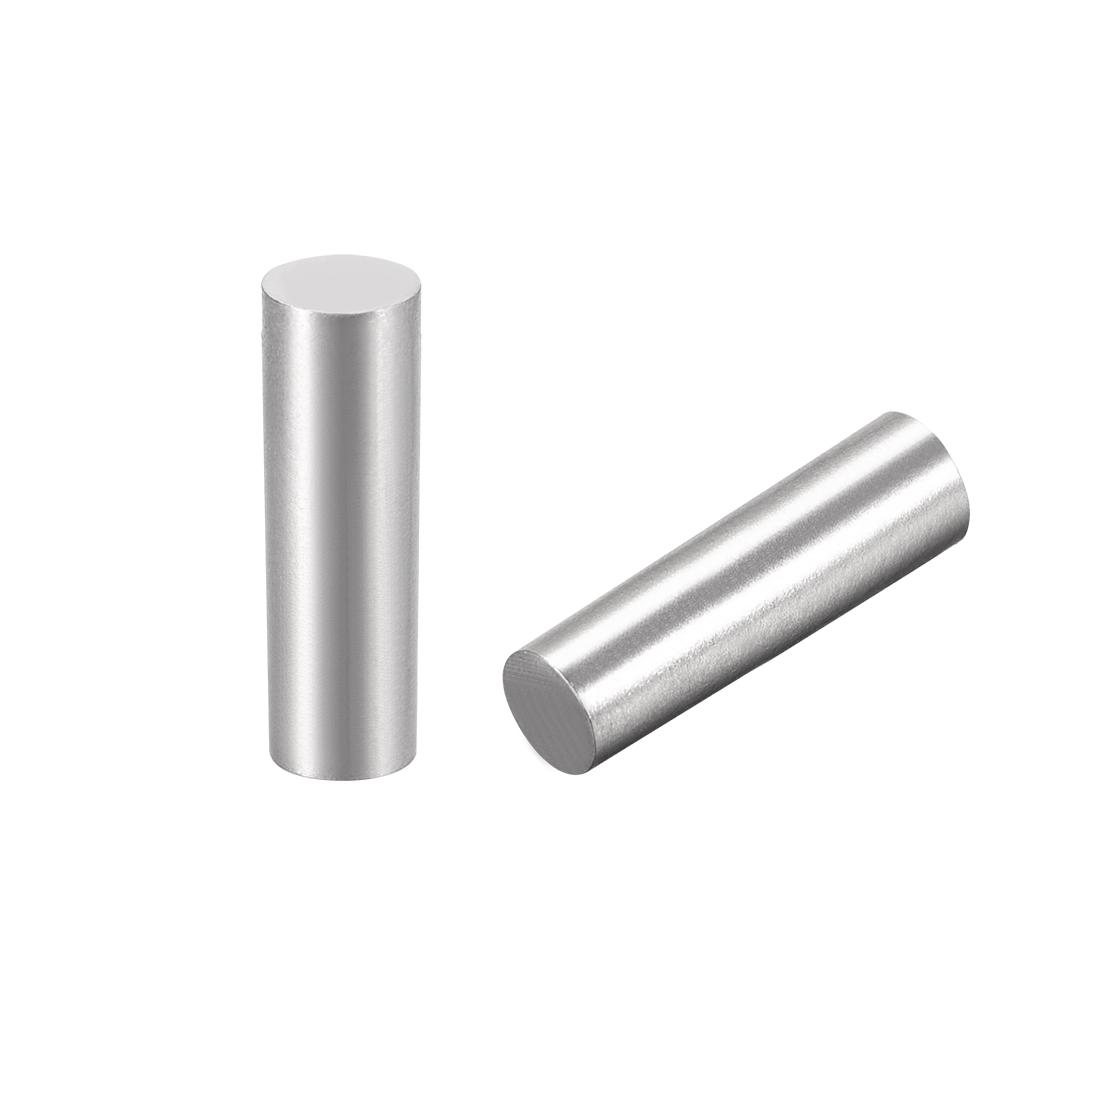 2Pcs 4mm x 20mm 1:50 Taper Pin 304 Stainless Steel Shelf Support Pin Fasten